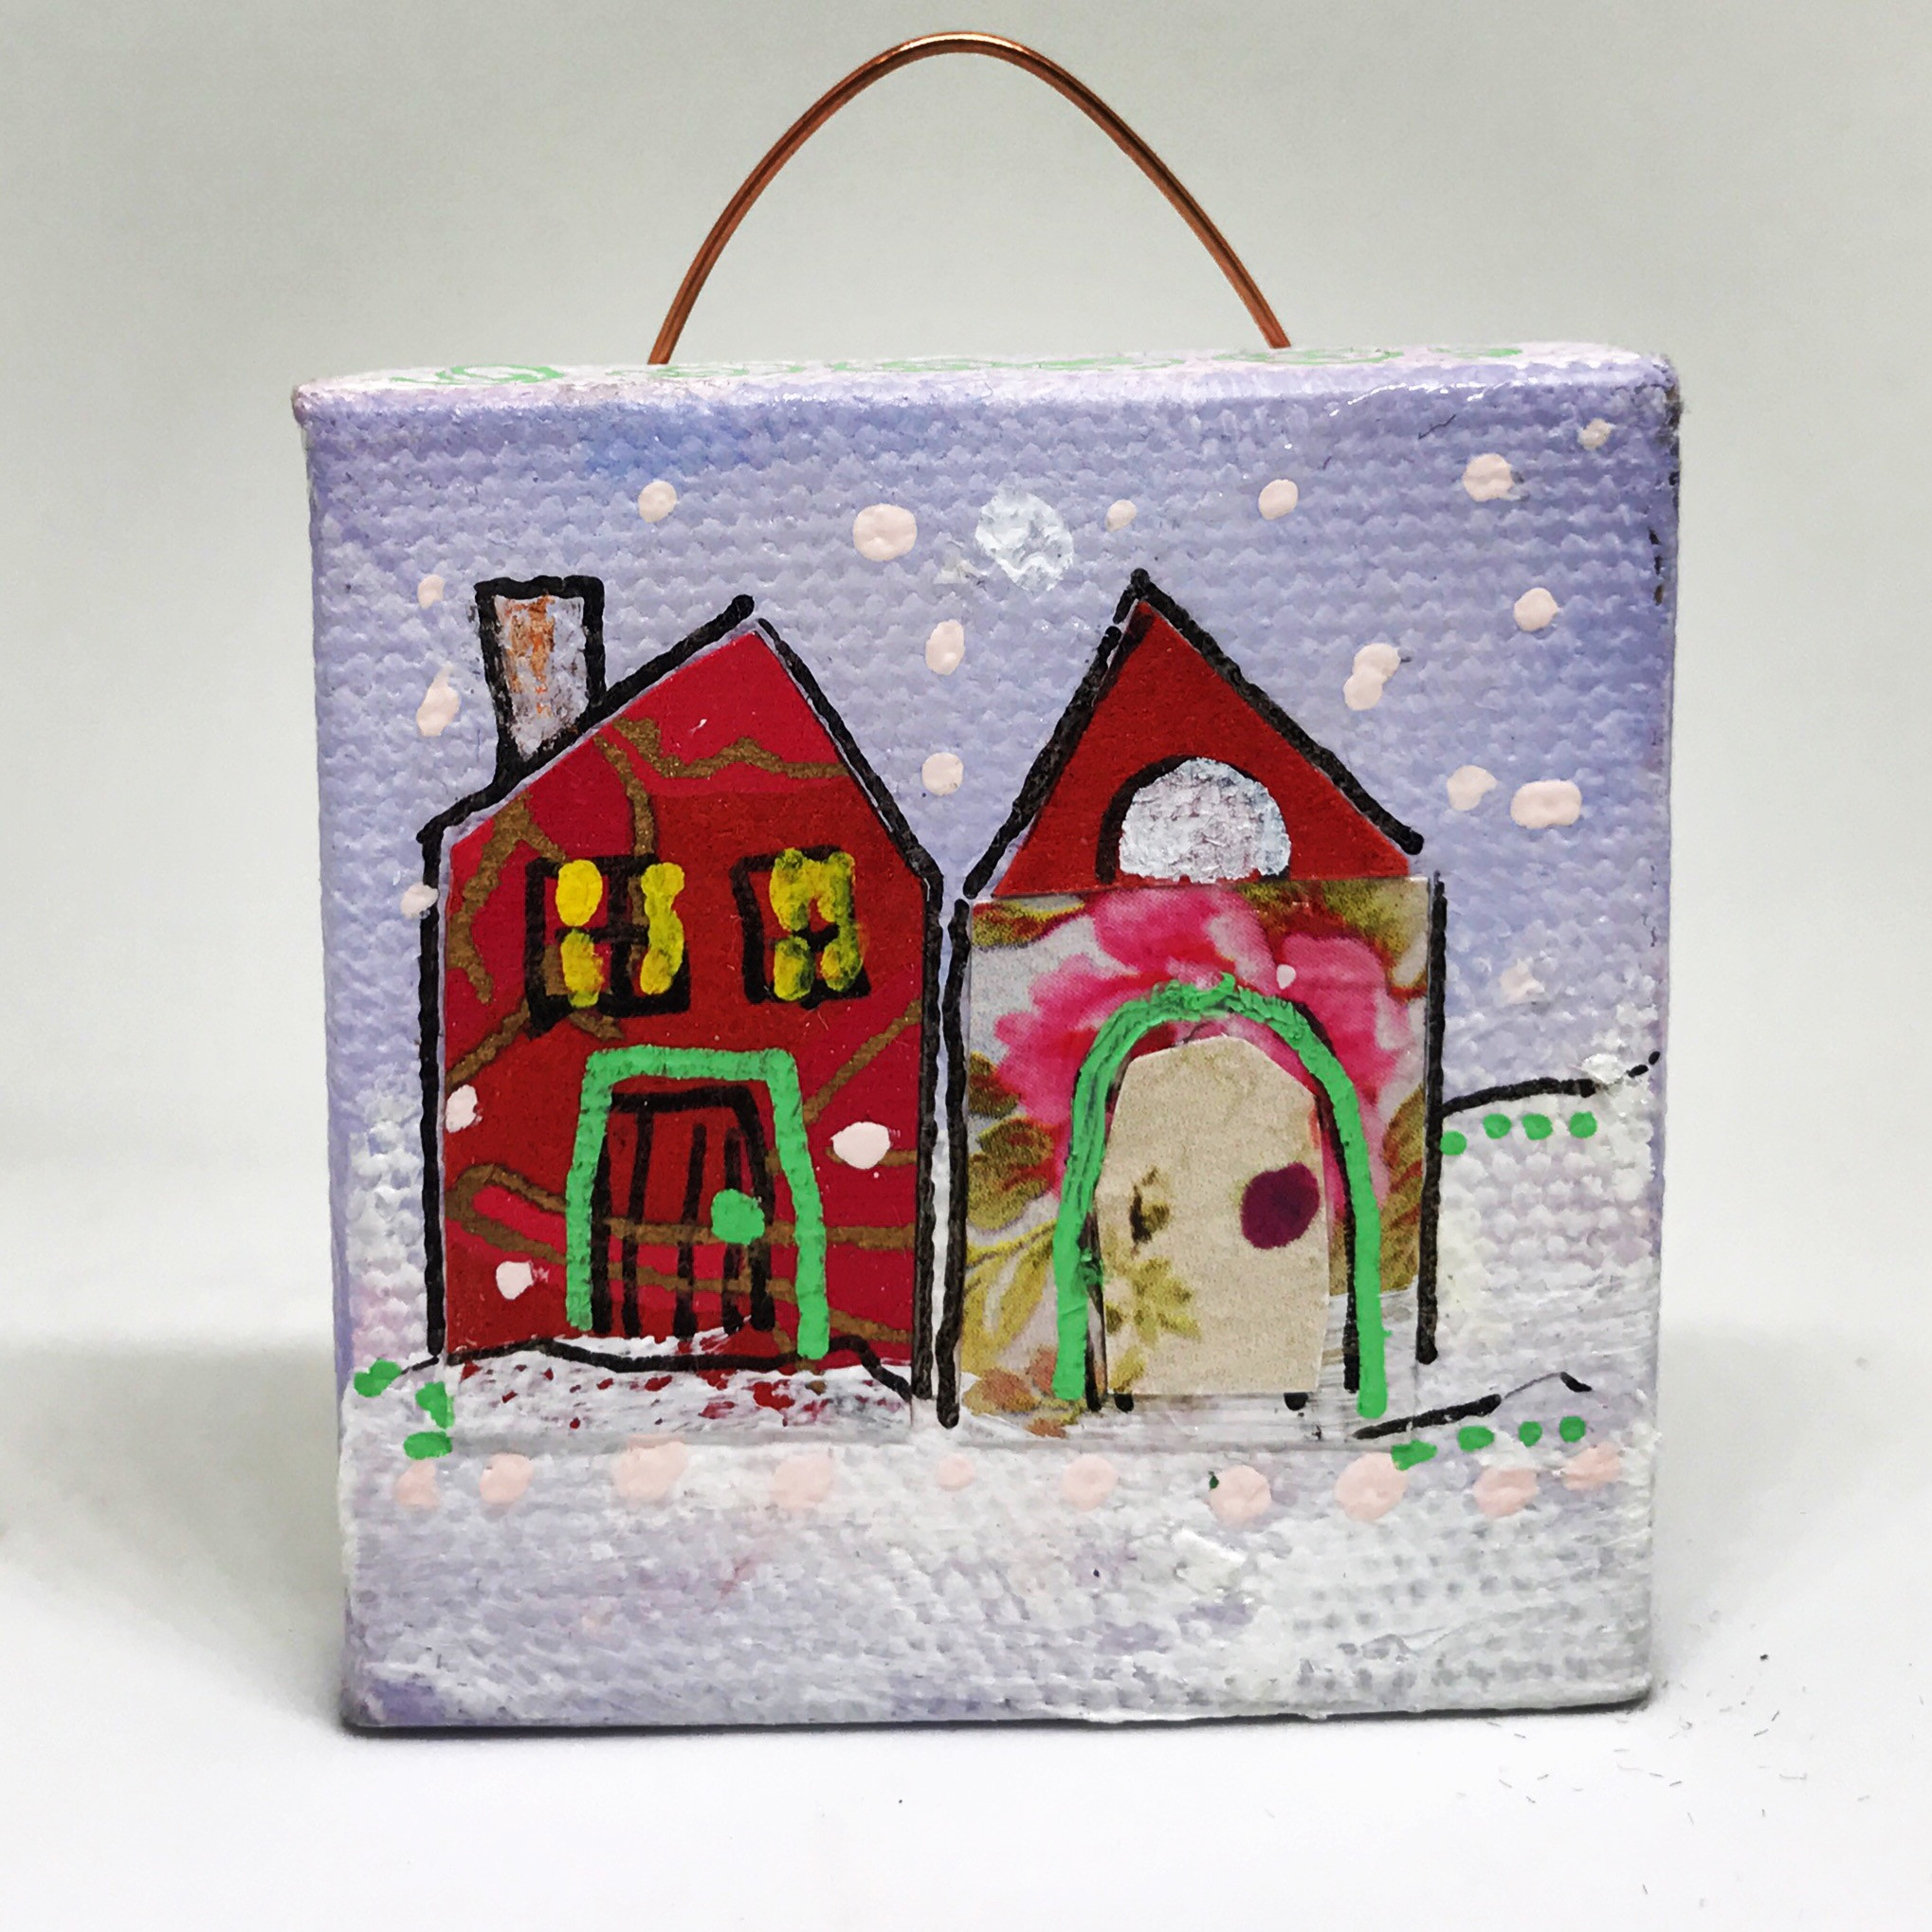 Winter Fairy Houses Nov 9 &16